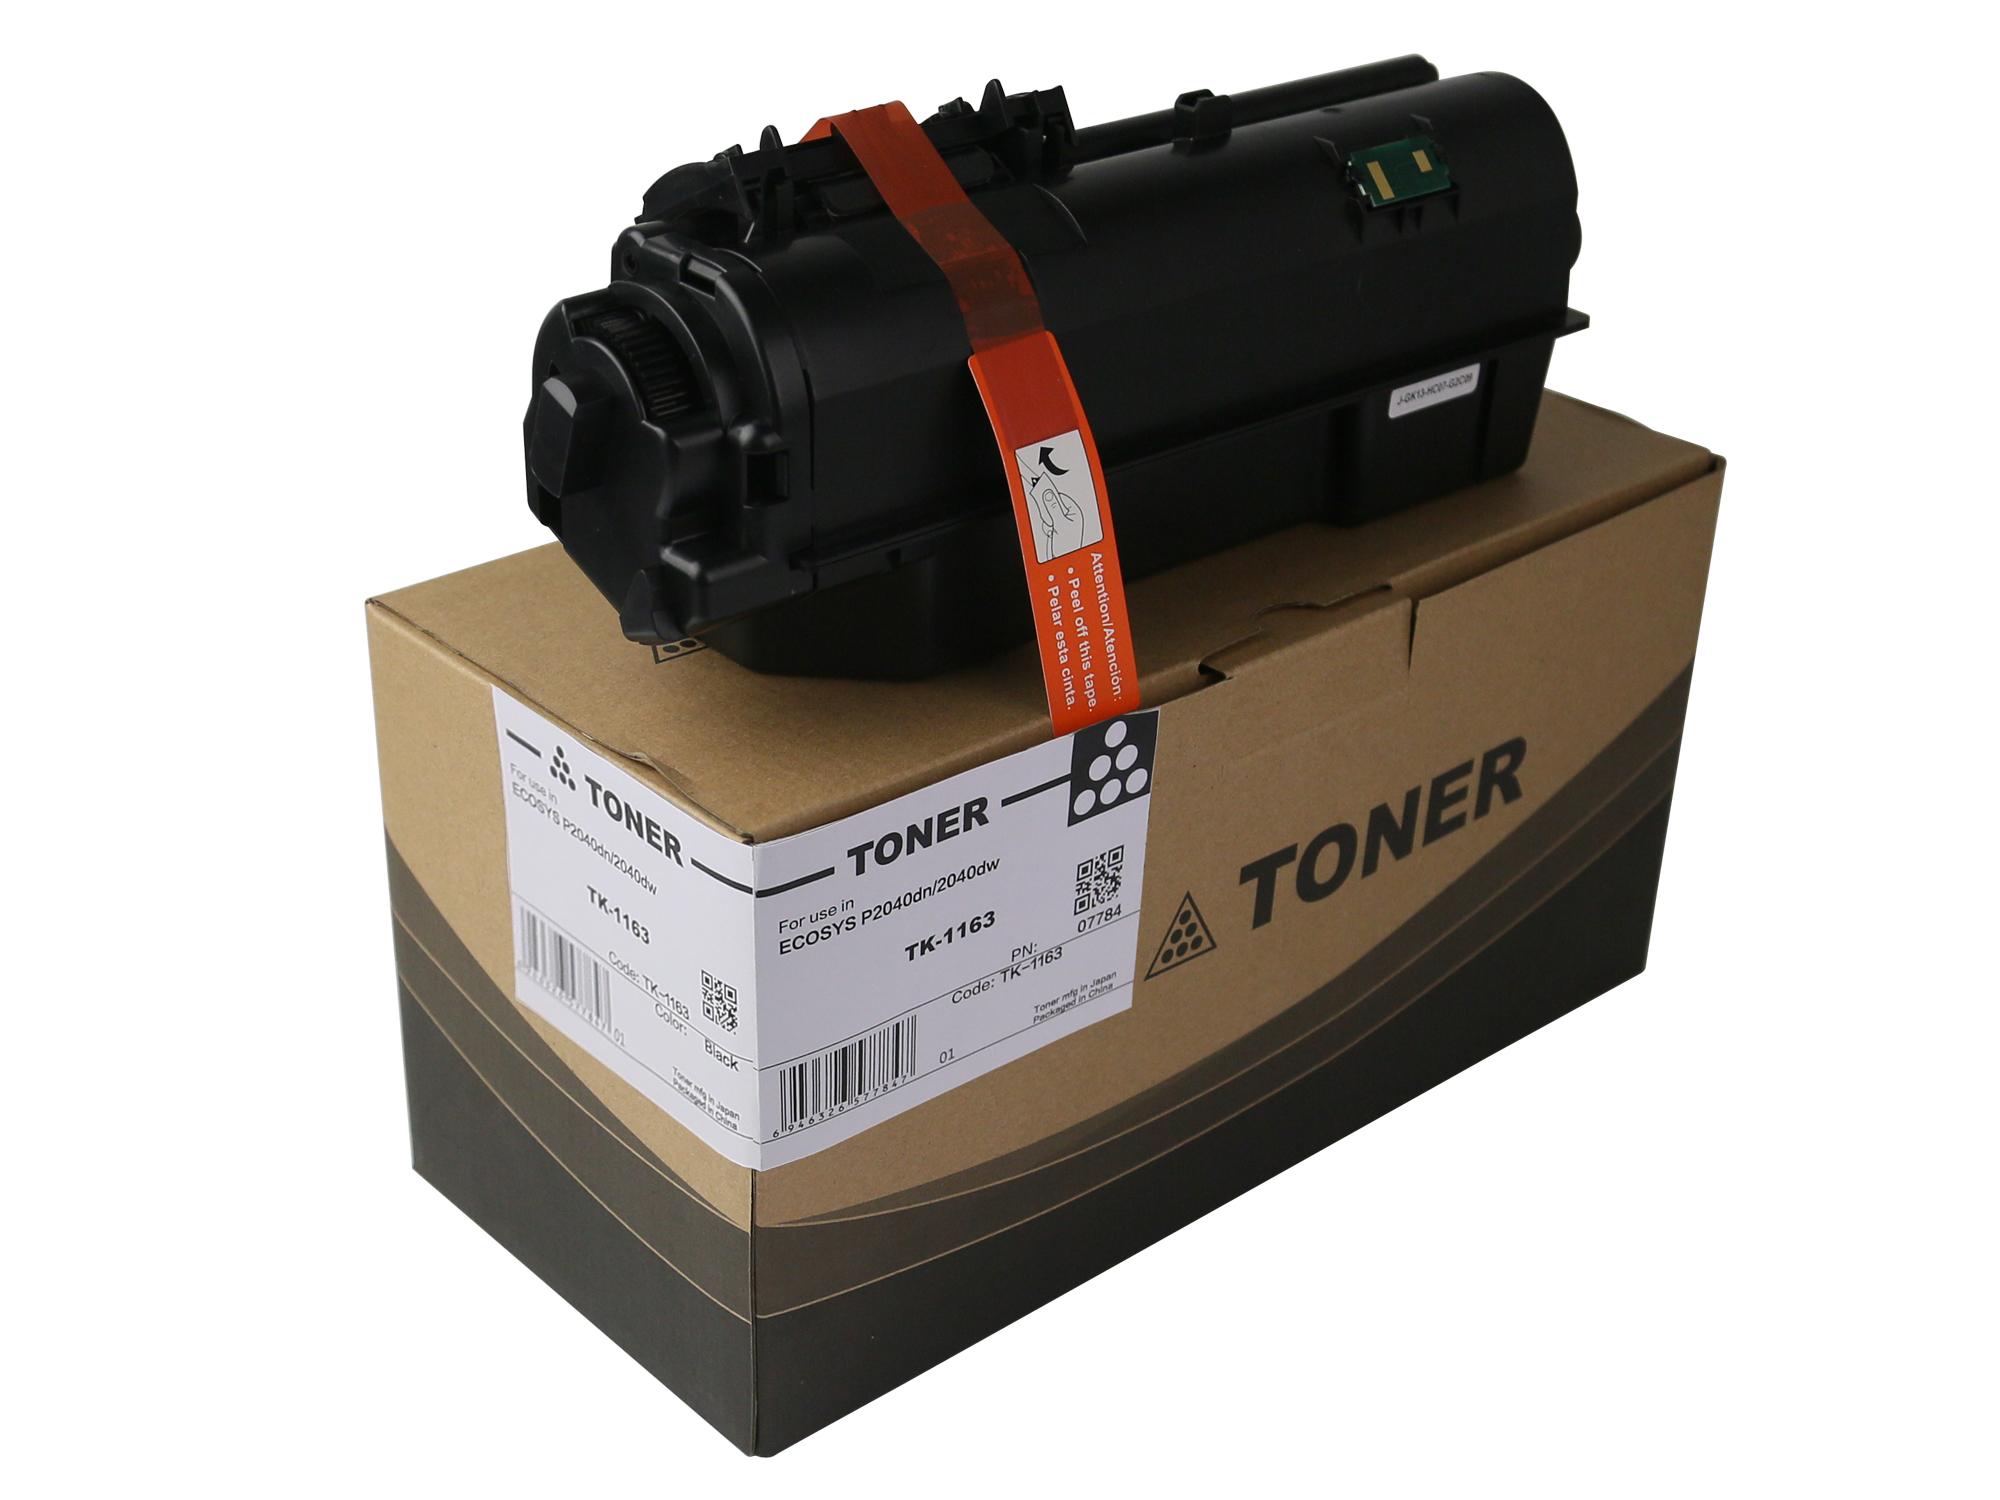 TK-1163 Toner Cartridge for Kyocera ECOSYS P2040dn